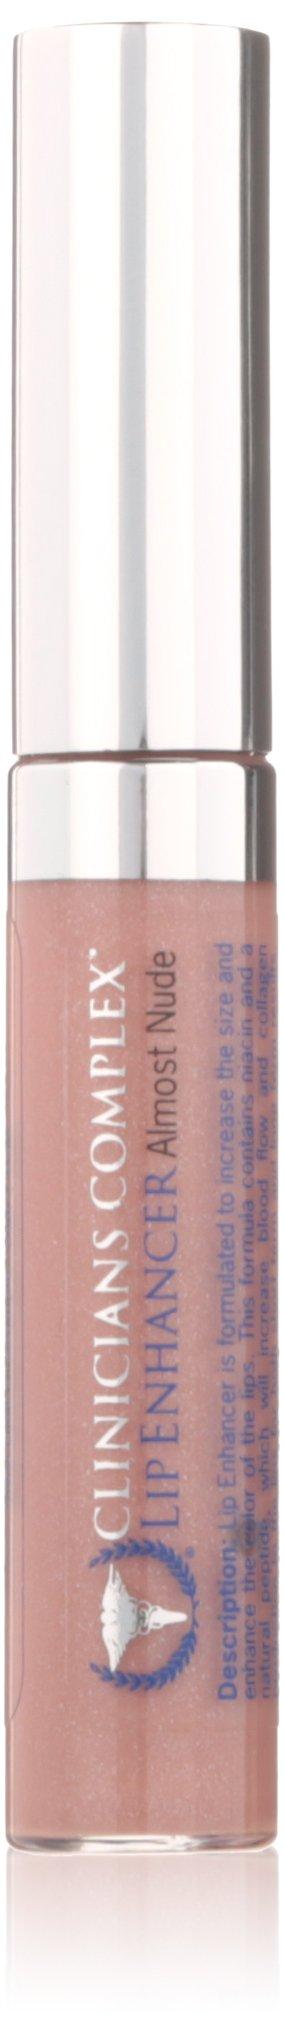 Clinicians Complex Lip Enhancer, Almost Nude, 0.25 Ounce